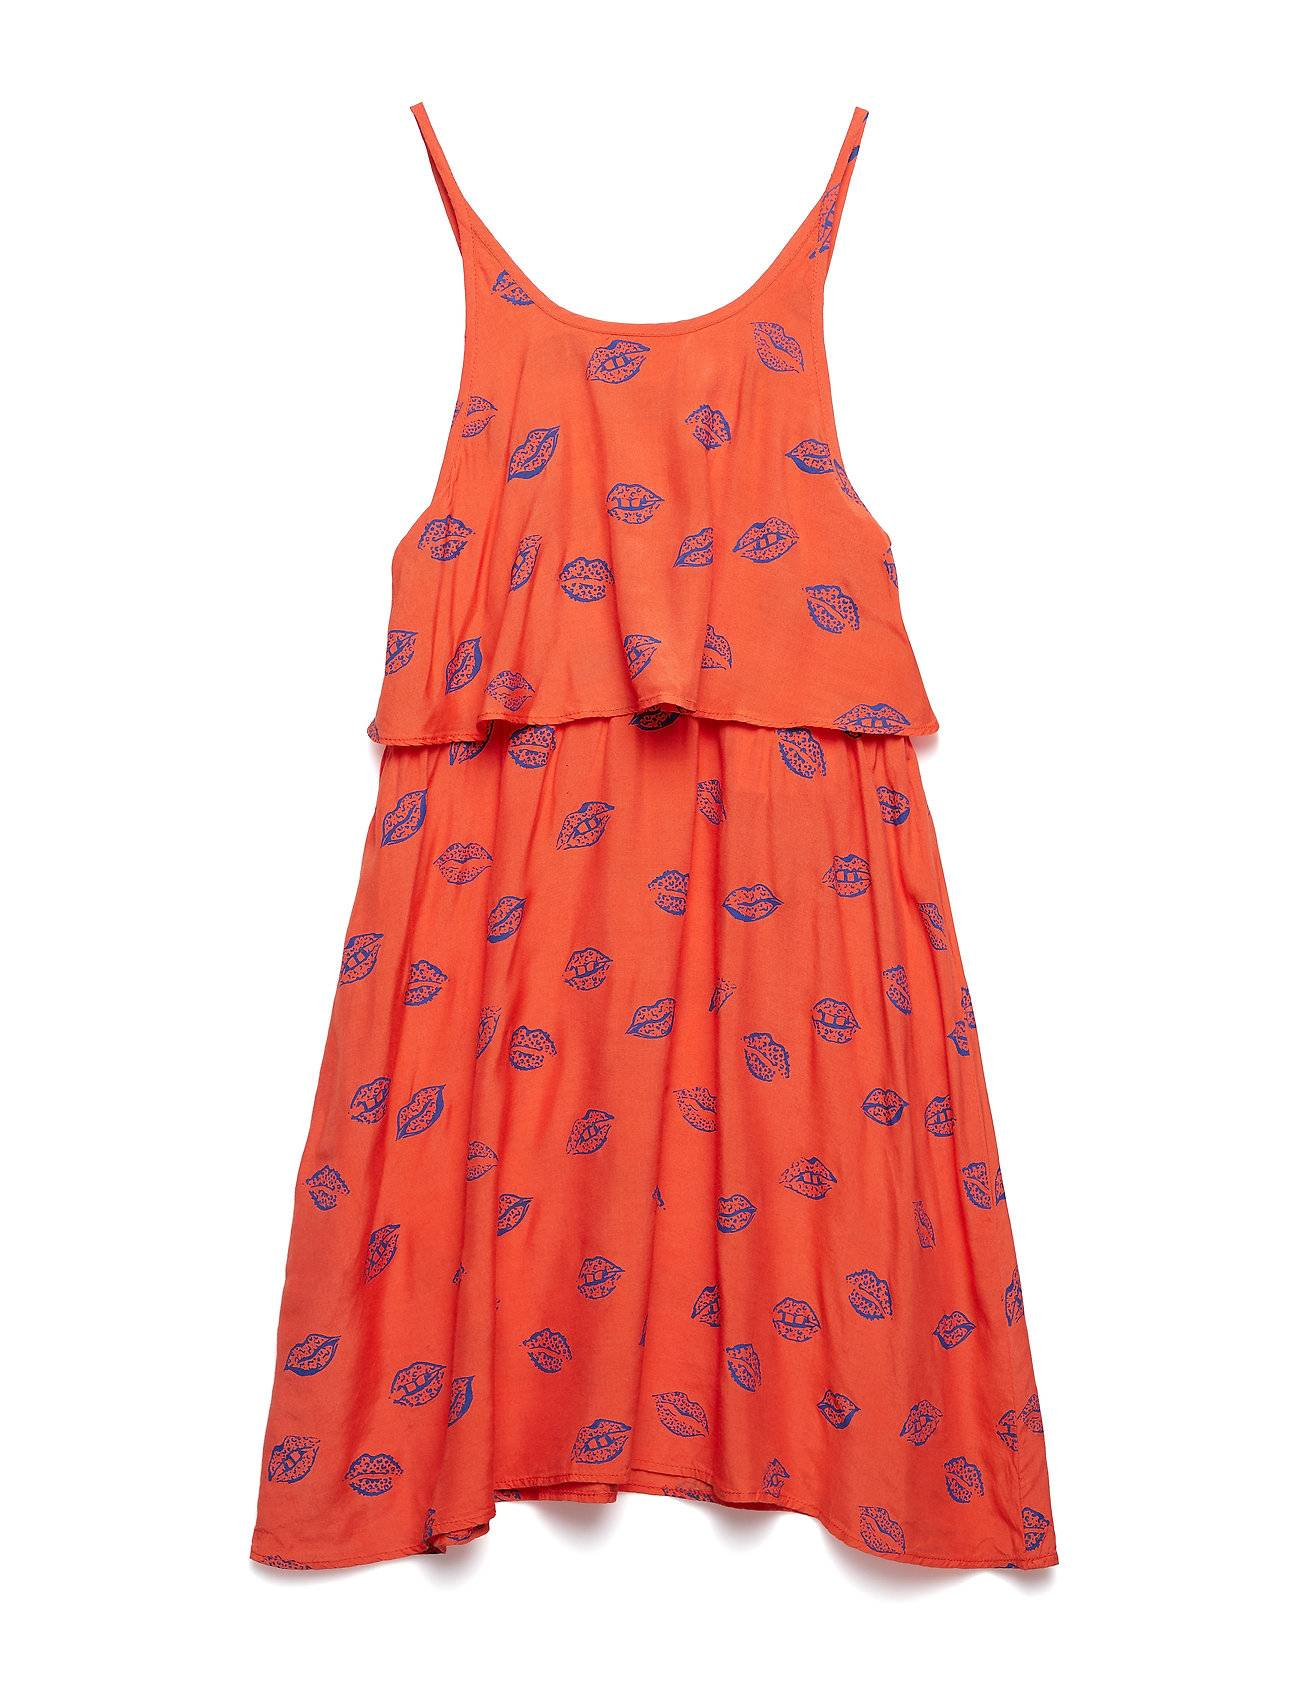 Soft Gallery Marisol Dress